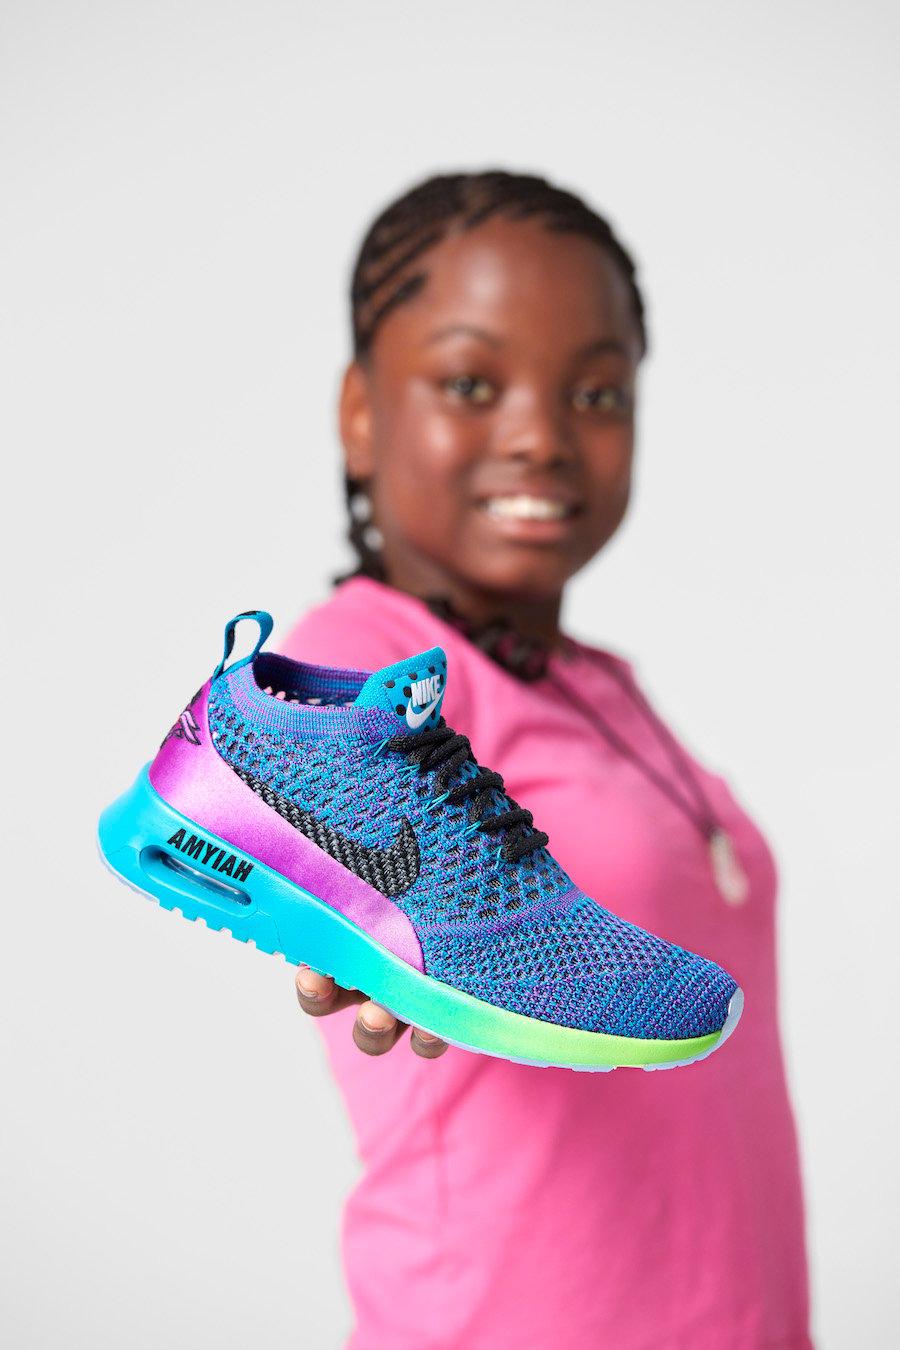 Nike Air Max Thea Ultra Flyknit Doernbecher Amyiah Robinson